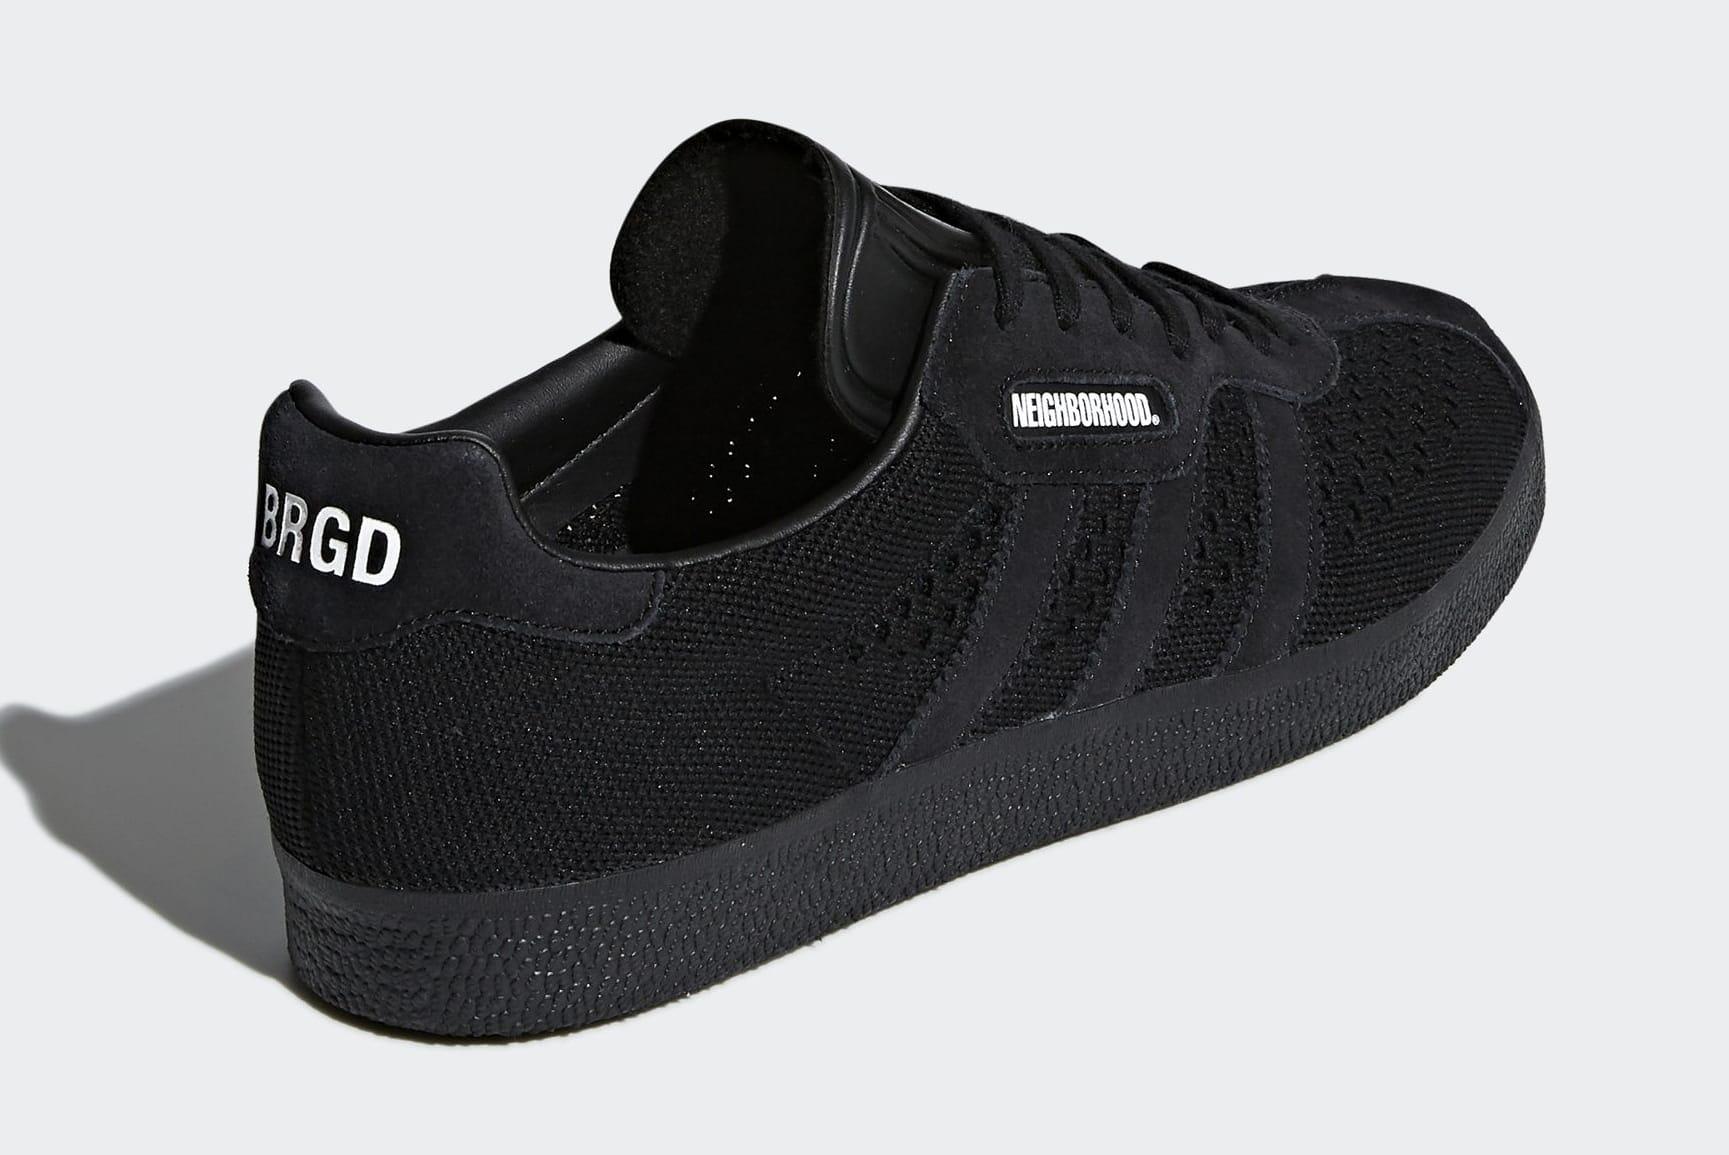 Neighborhood x Adidas Gazelle Super DA8836 (Heel)